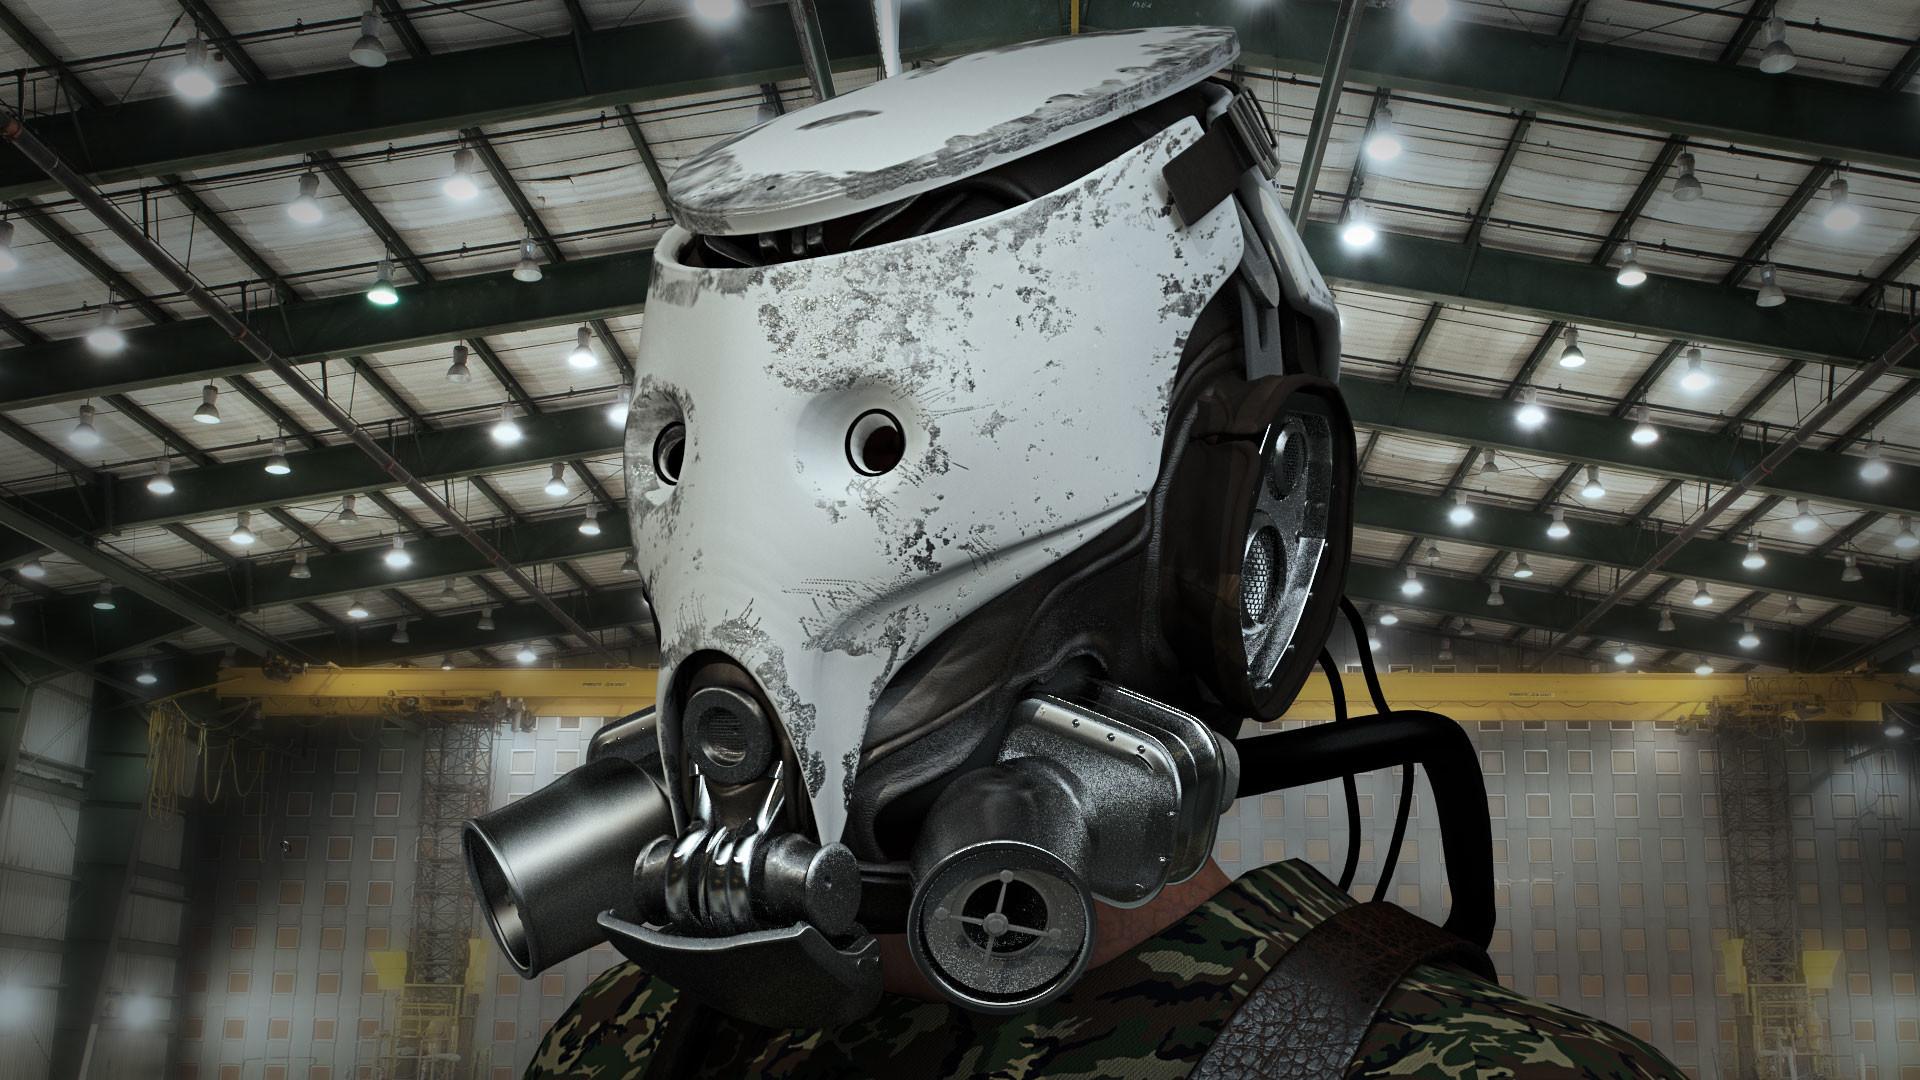 Fabricio rezende fabricio rezende helmet hangar